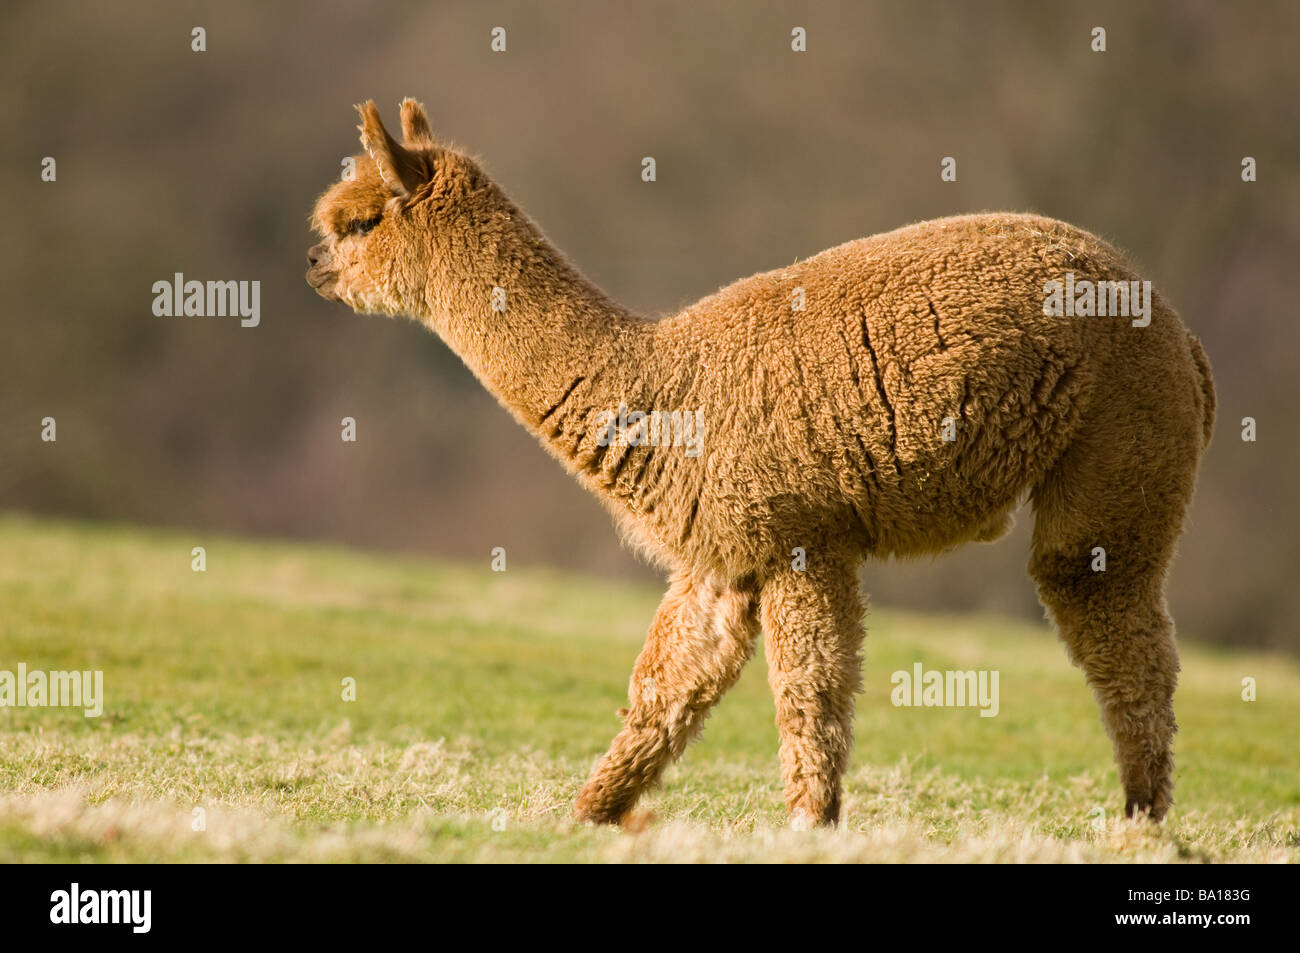 ALPACA Lama pacos - Stock Image